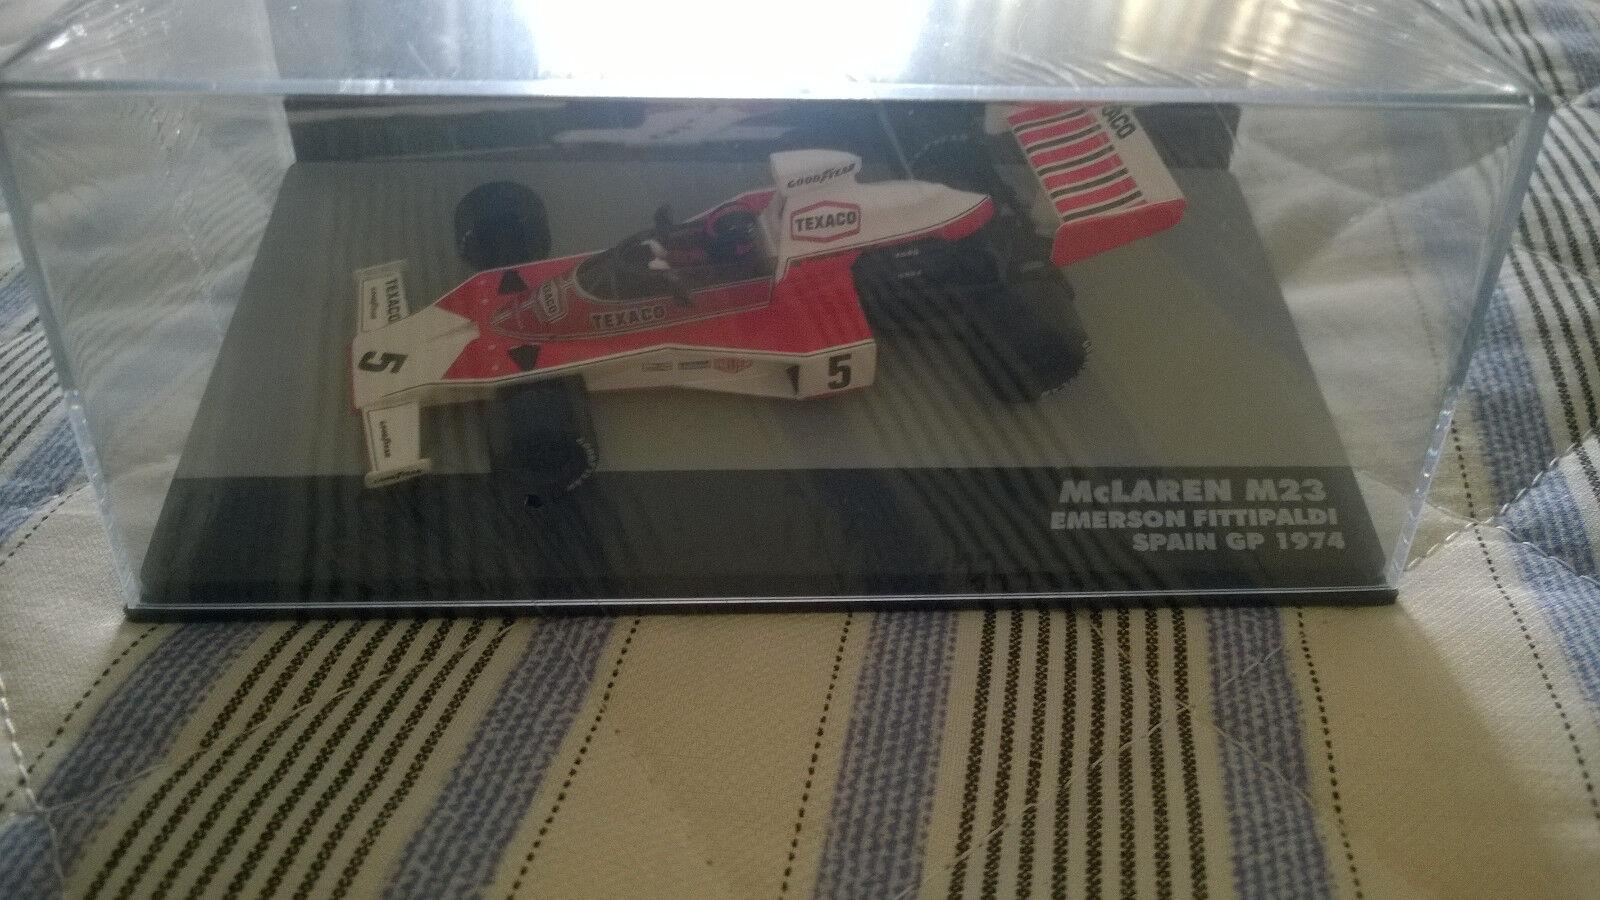 1974 McLaren M23 Eaglemoss 1 43 Emerson fiitipaldi